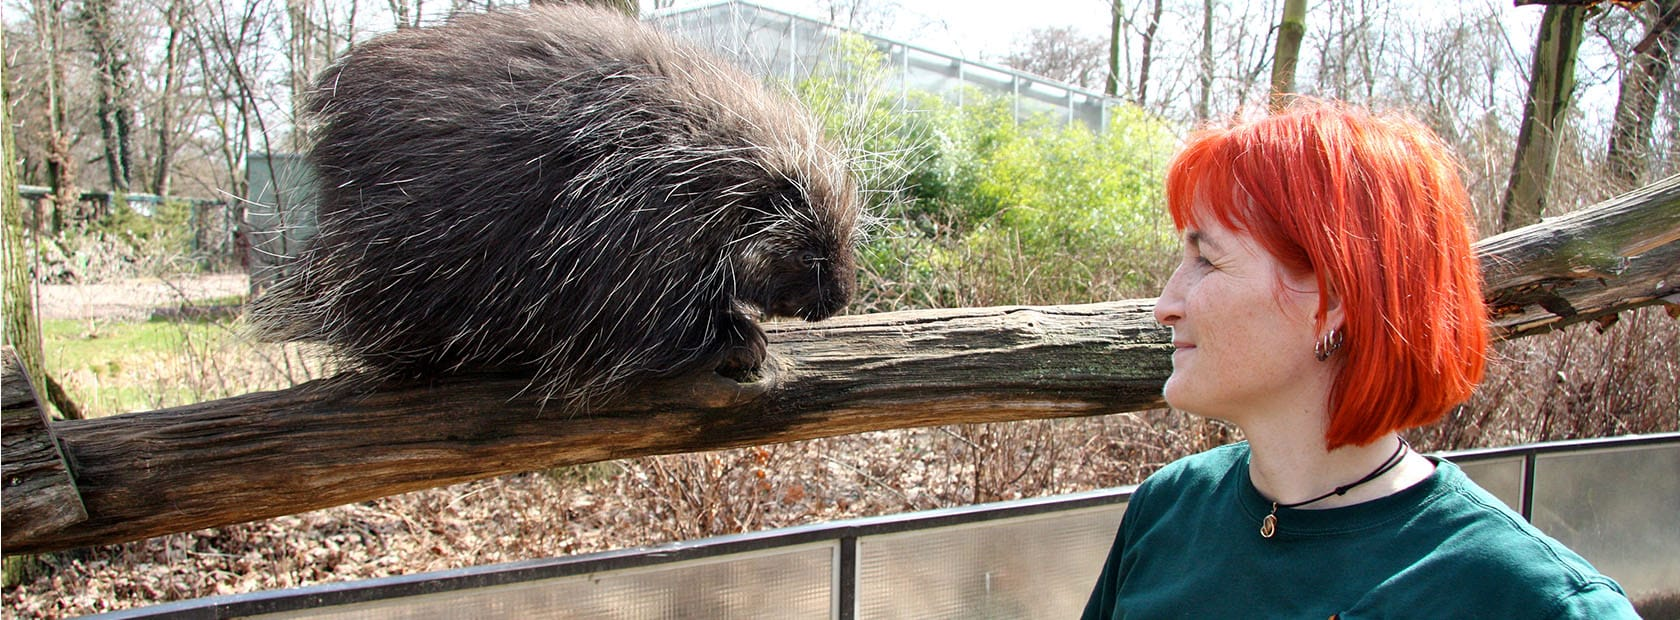 Arbeiten im Zoo